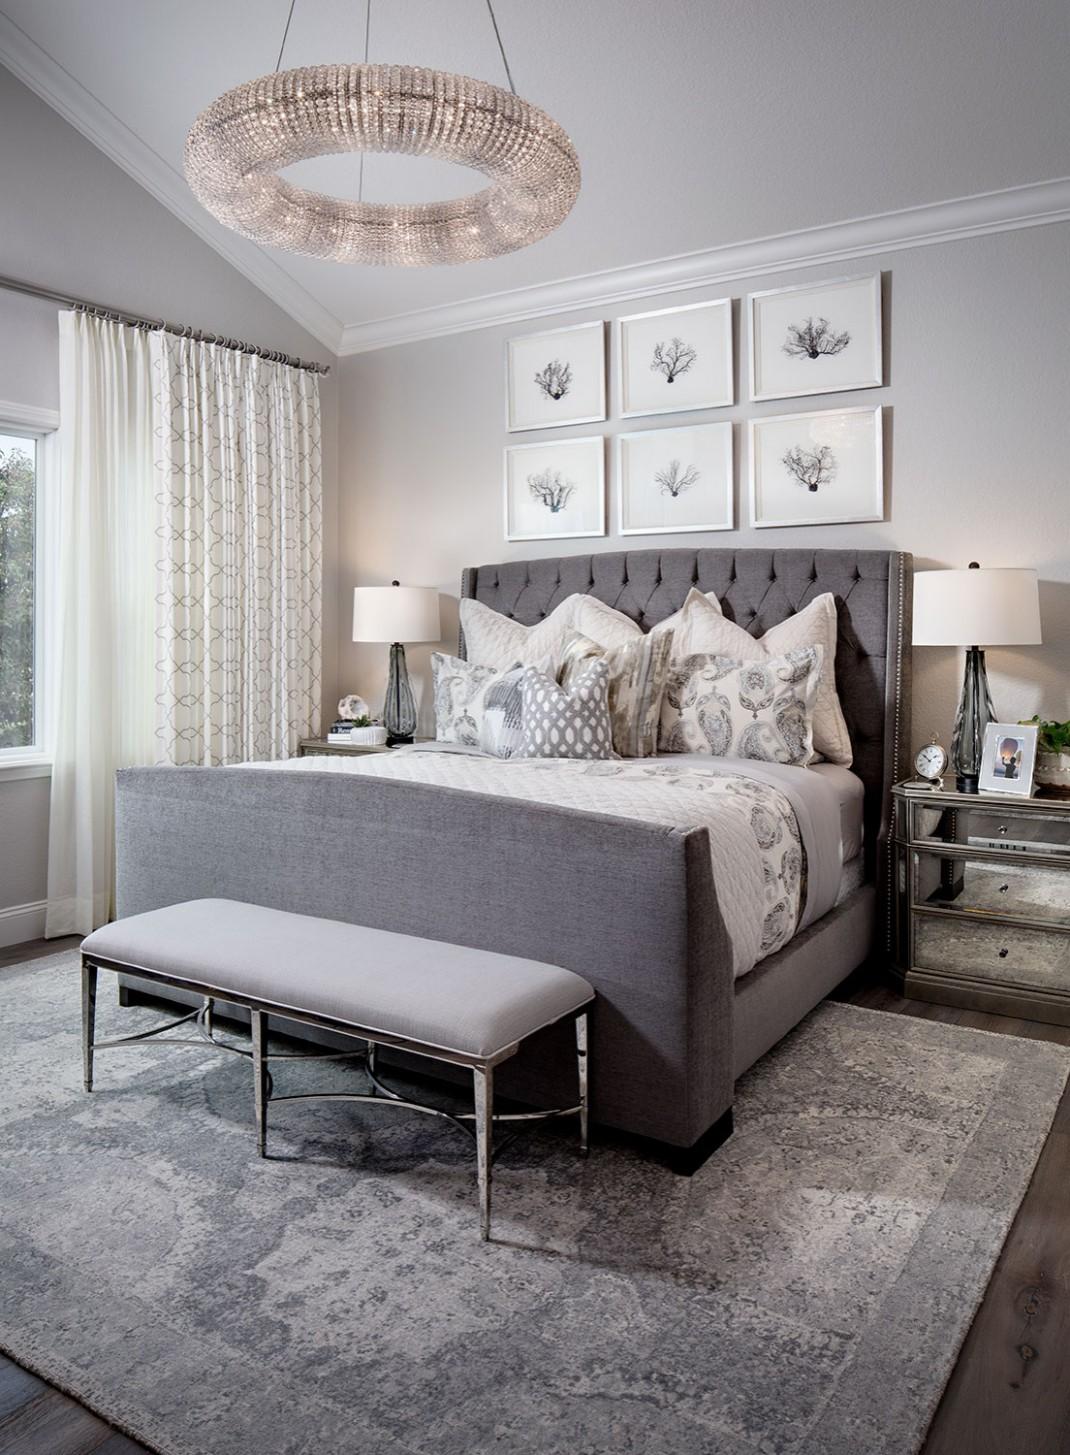 10 Beautiful Gray Bedroom Pictures & Ideas - November, 10  Houzz - Bedroom Ideas Grey